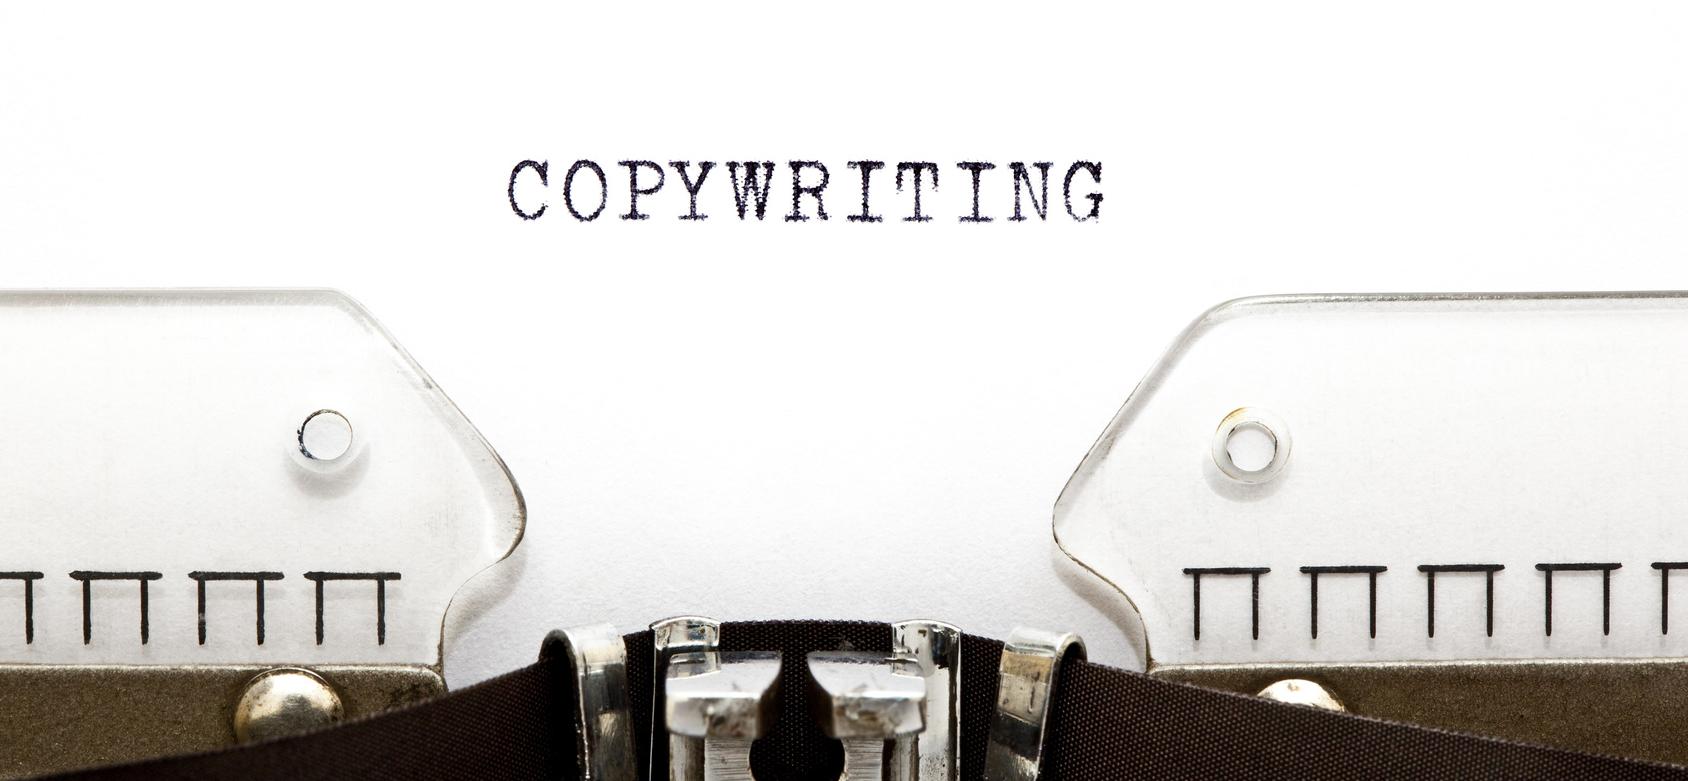 copyriting